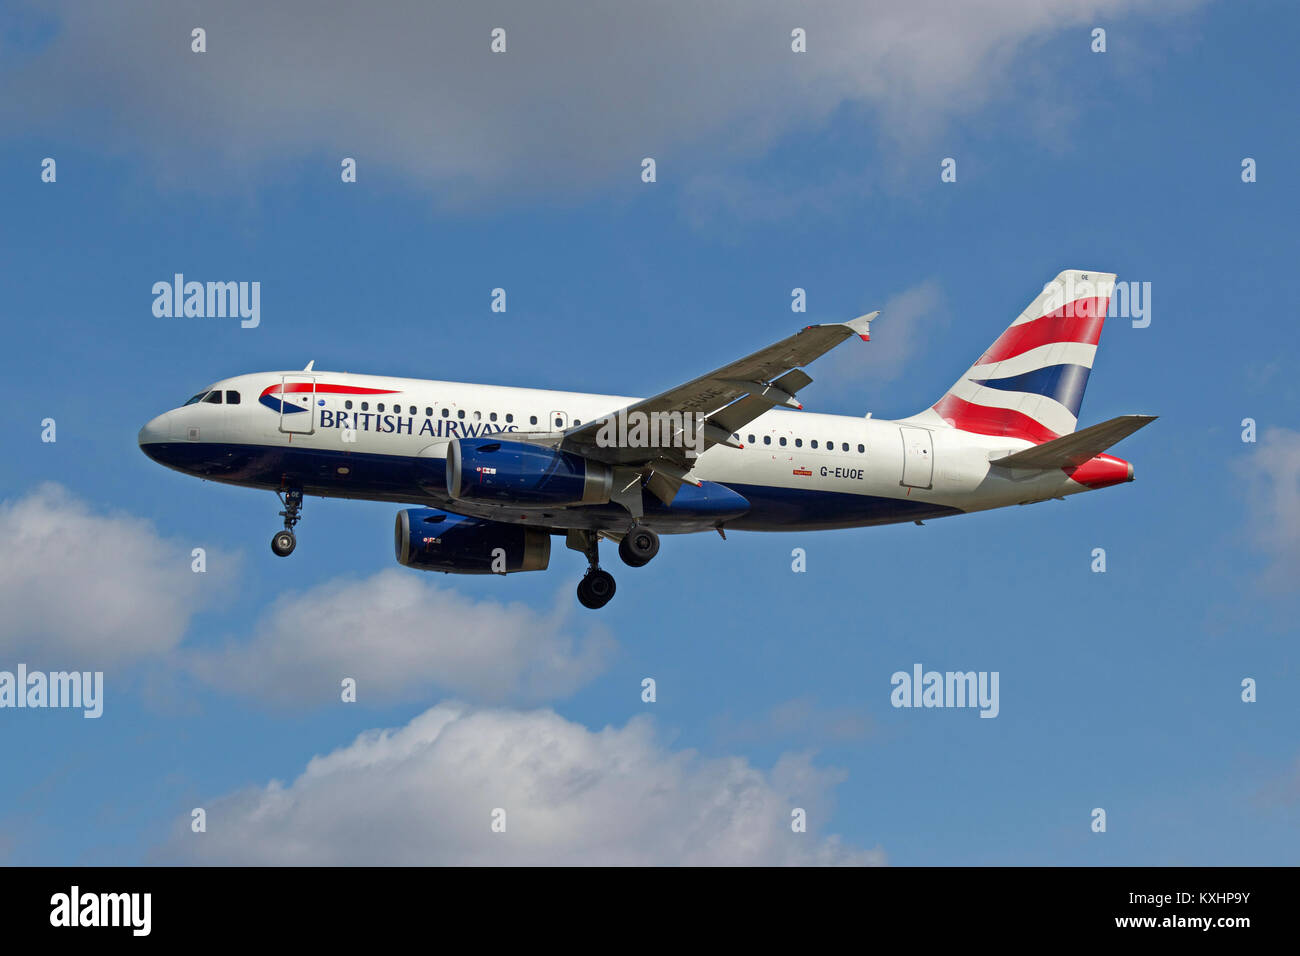 British Airways Airbus A319-131 G-EUOE landing at London Heathrow. Stock Photo